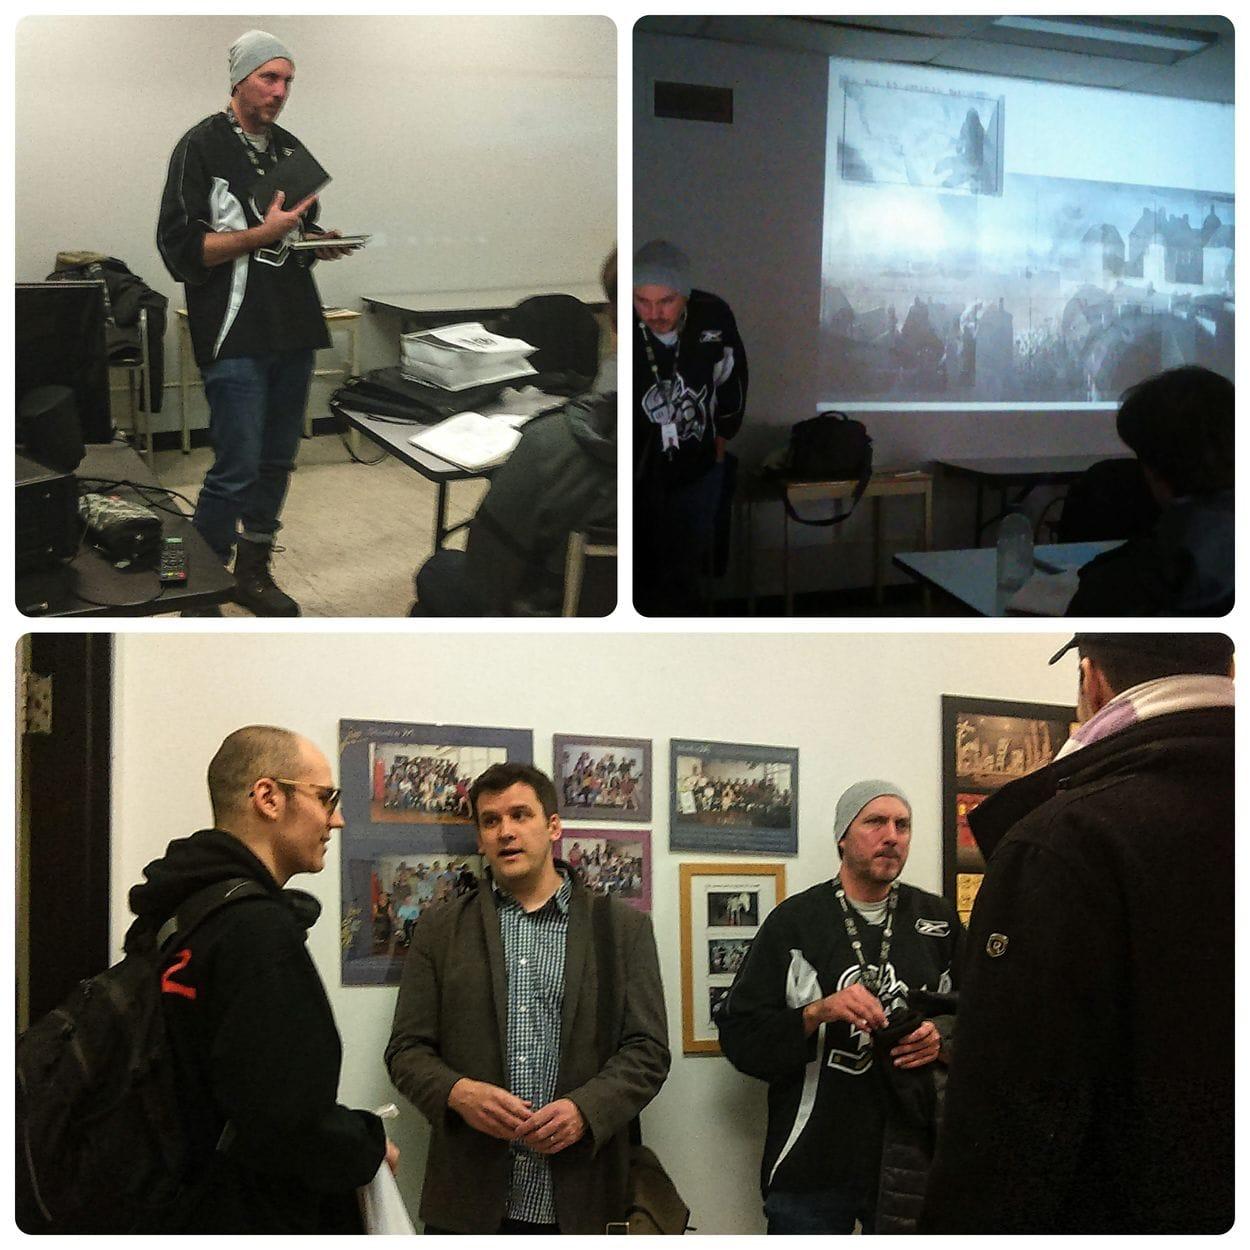 Visit from Ubisoft Art Director- Patrick Ingoldsby - Jan 17/19